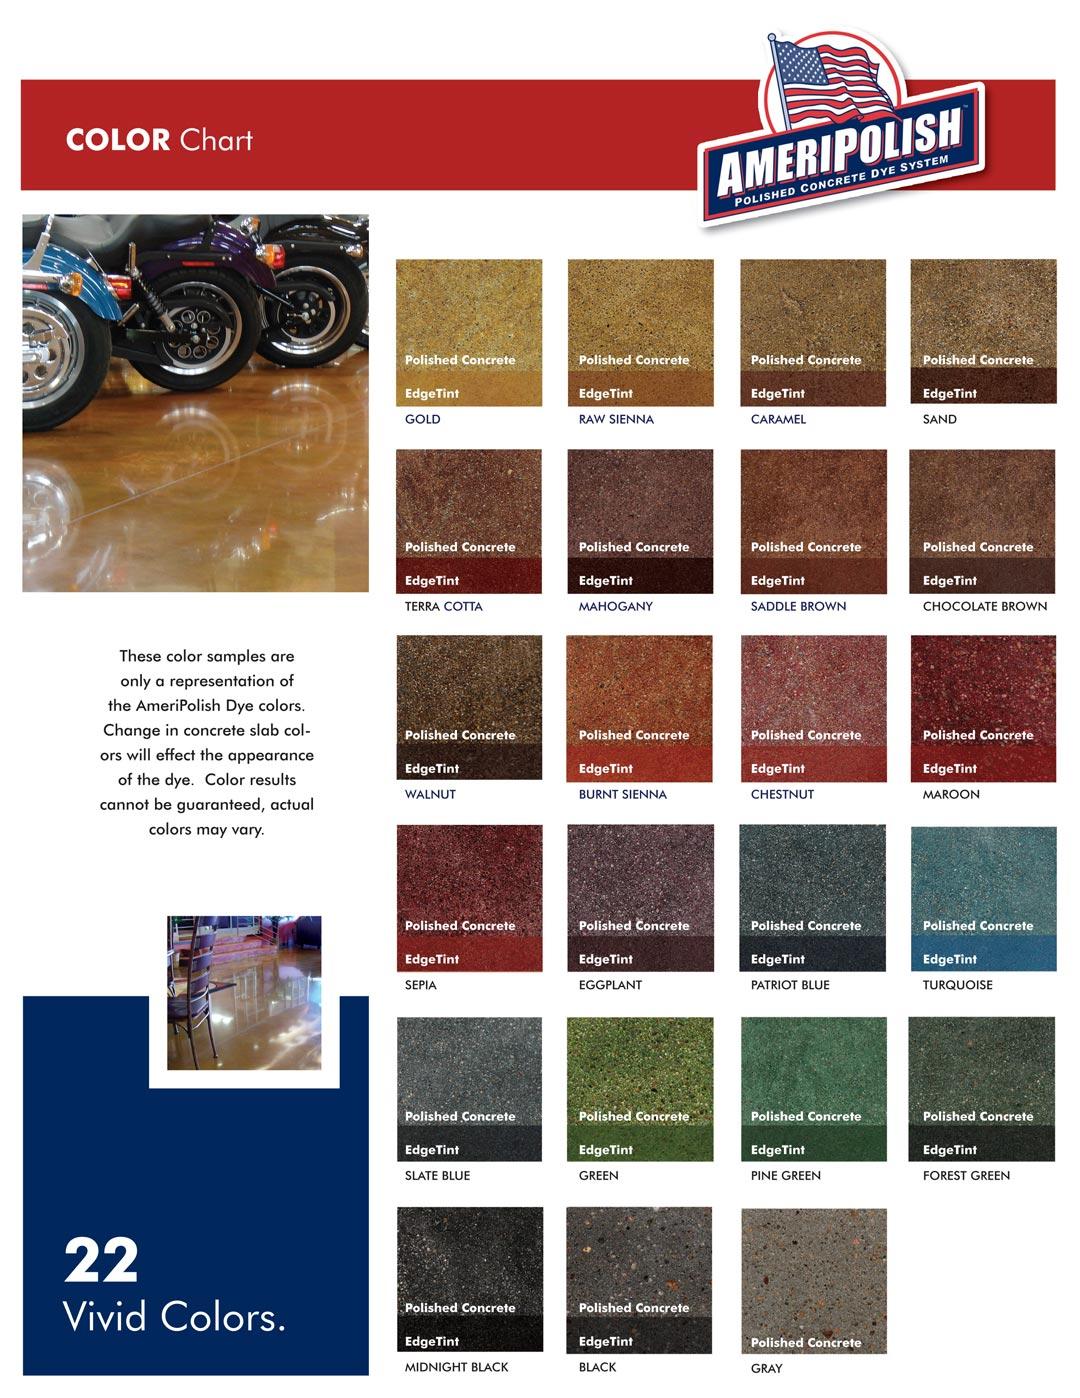 Color chart pristine concrete ameripolishcolorchart dyecolorchartnov2010 nvjuhfo Gallery